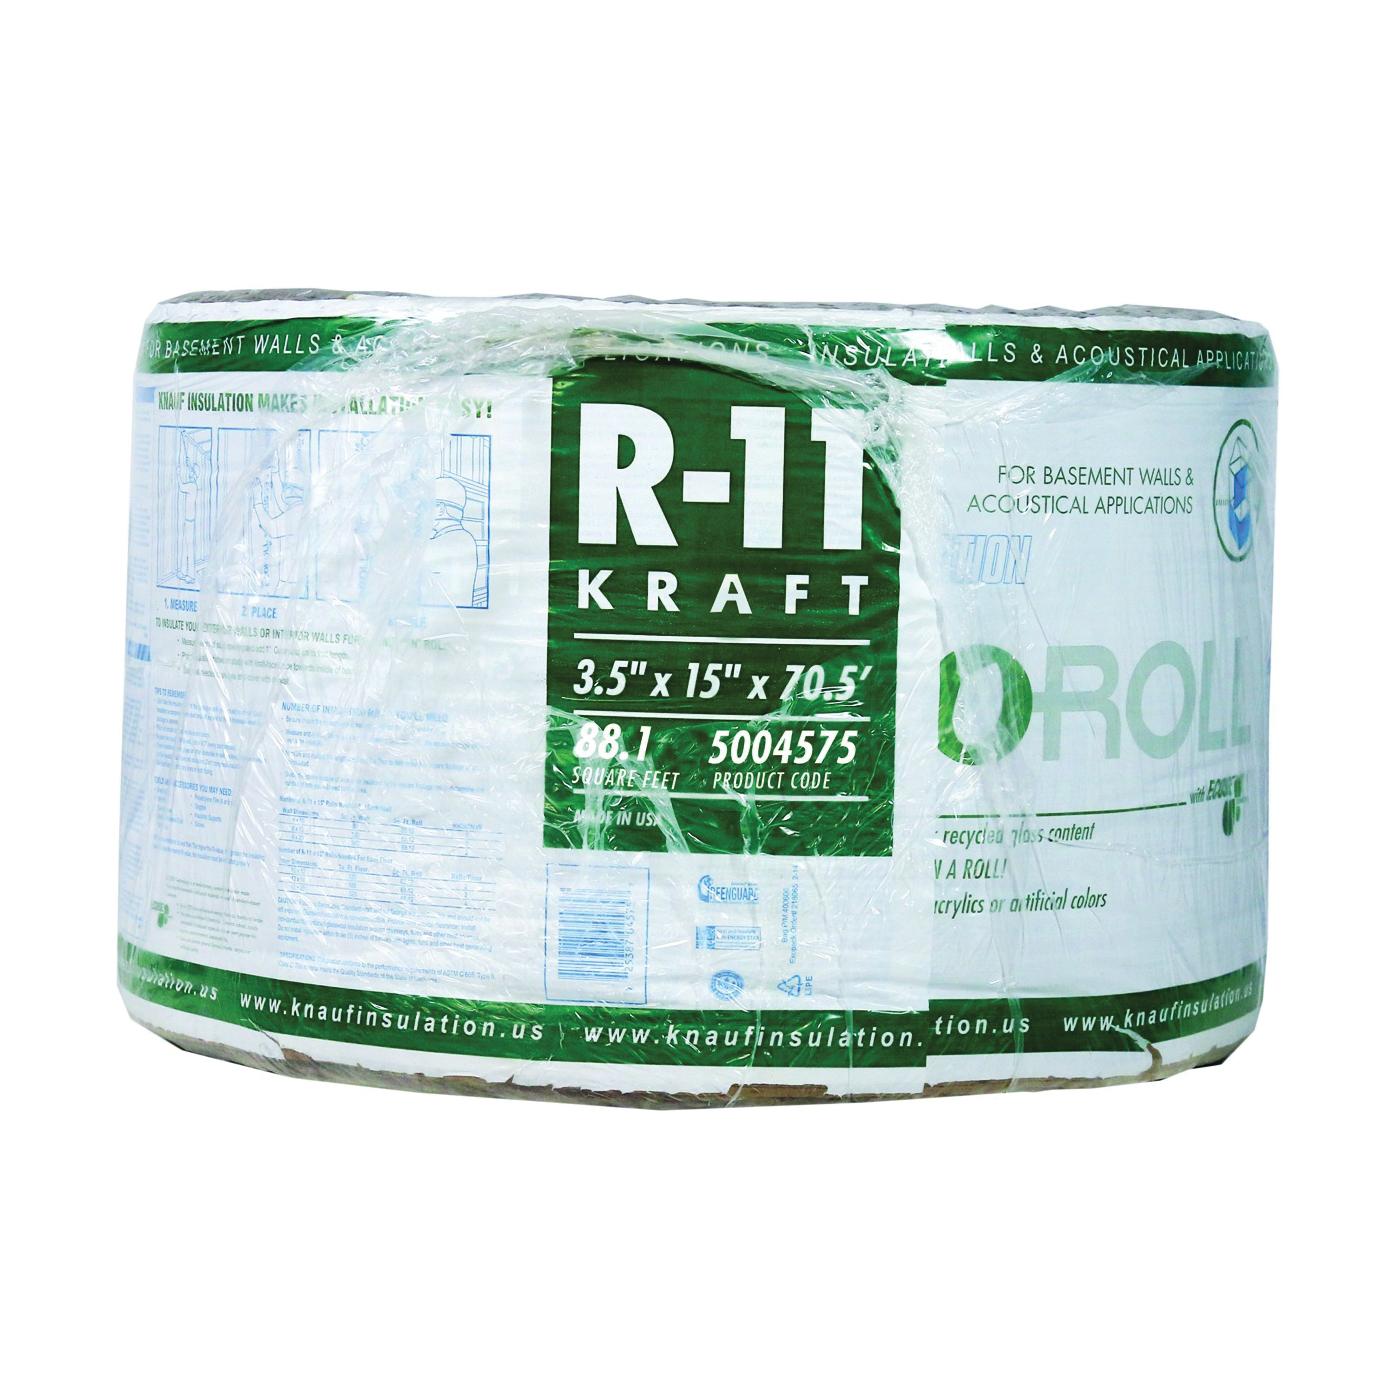 Picture of Knauf Insulation EcoRoll KR41E/TAK Fiberglass Insulation, 70-1/2 ft L, 15 in W, R-11 R-Value, Steel, Brown